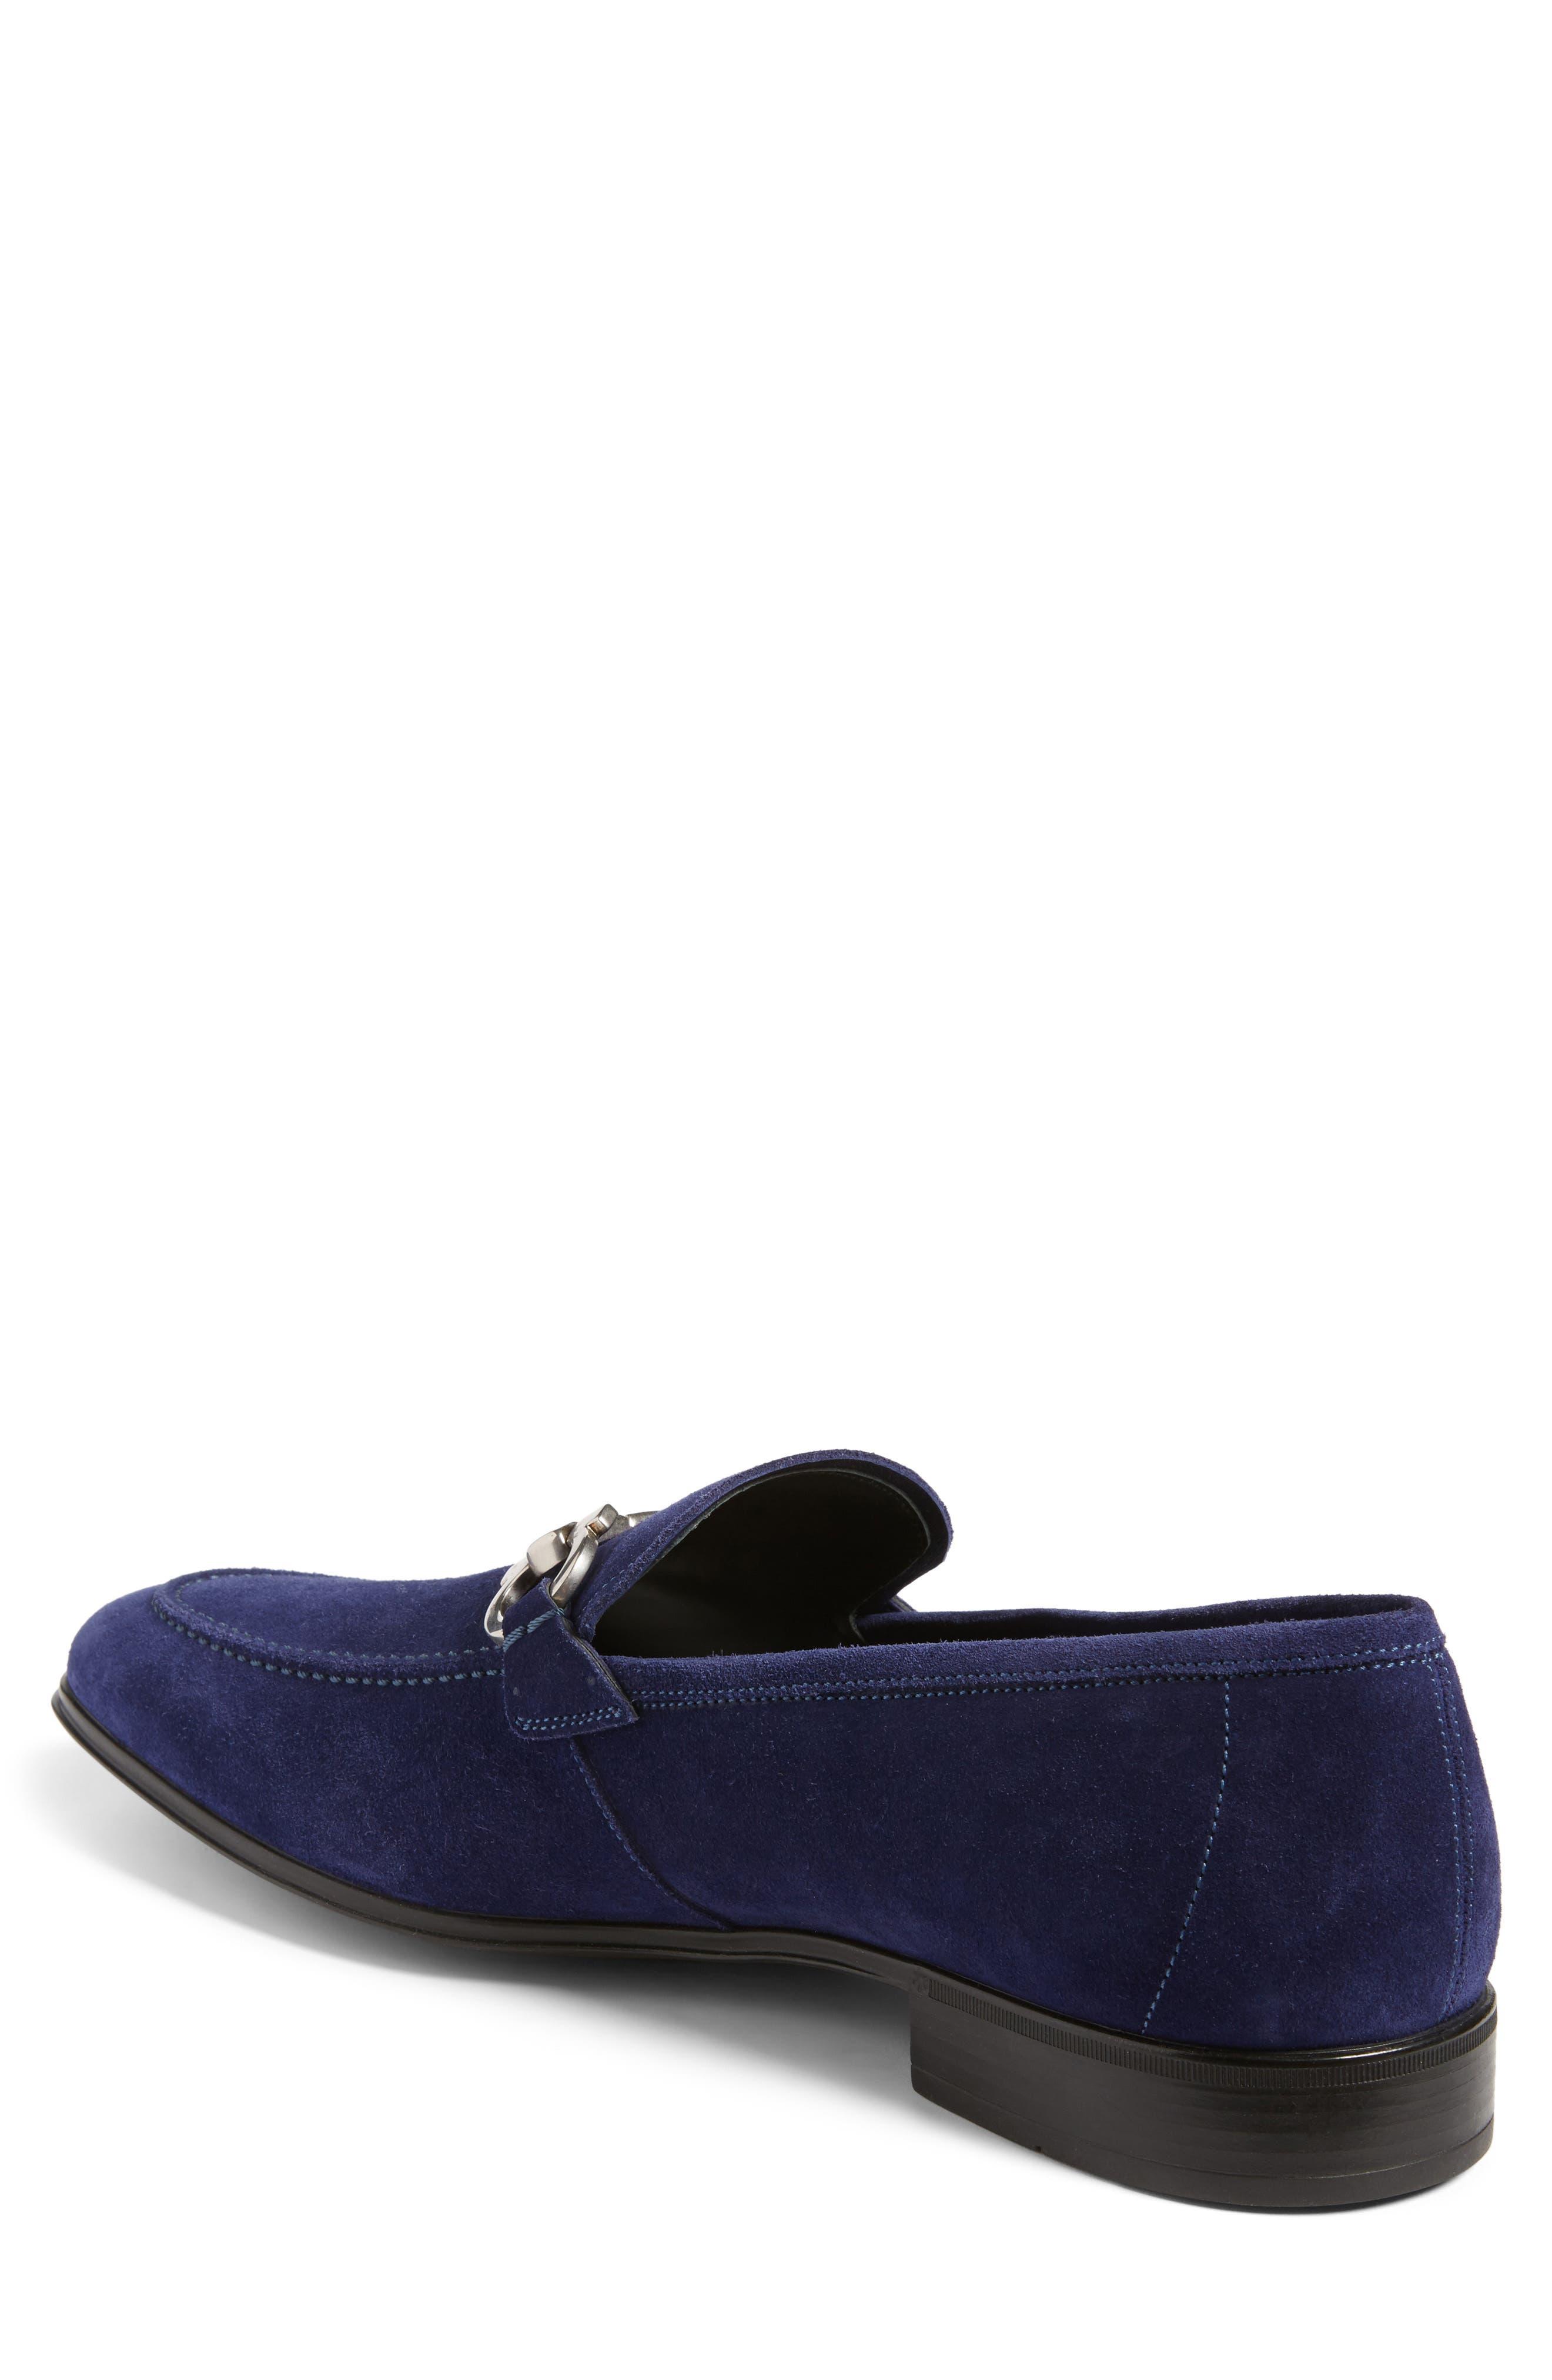 Men S Salvatore Ferragamo Slip On Loafers Driving Shoes